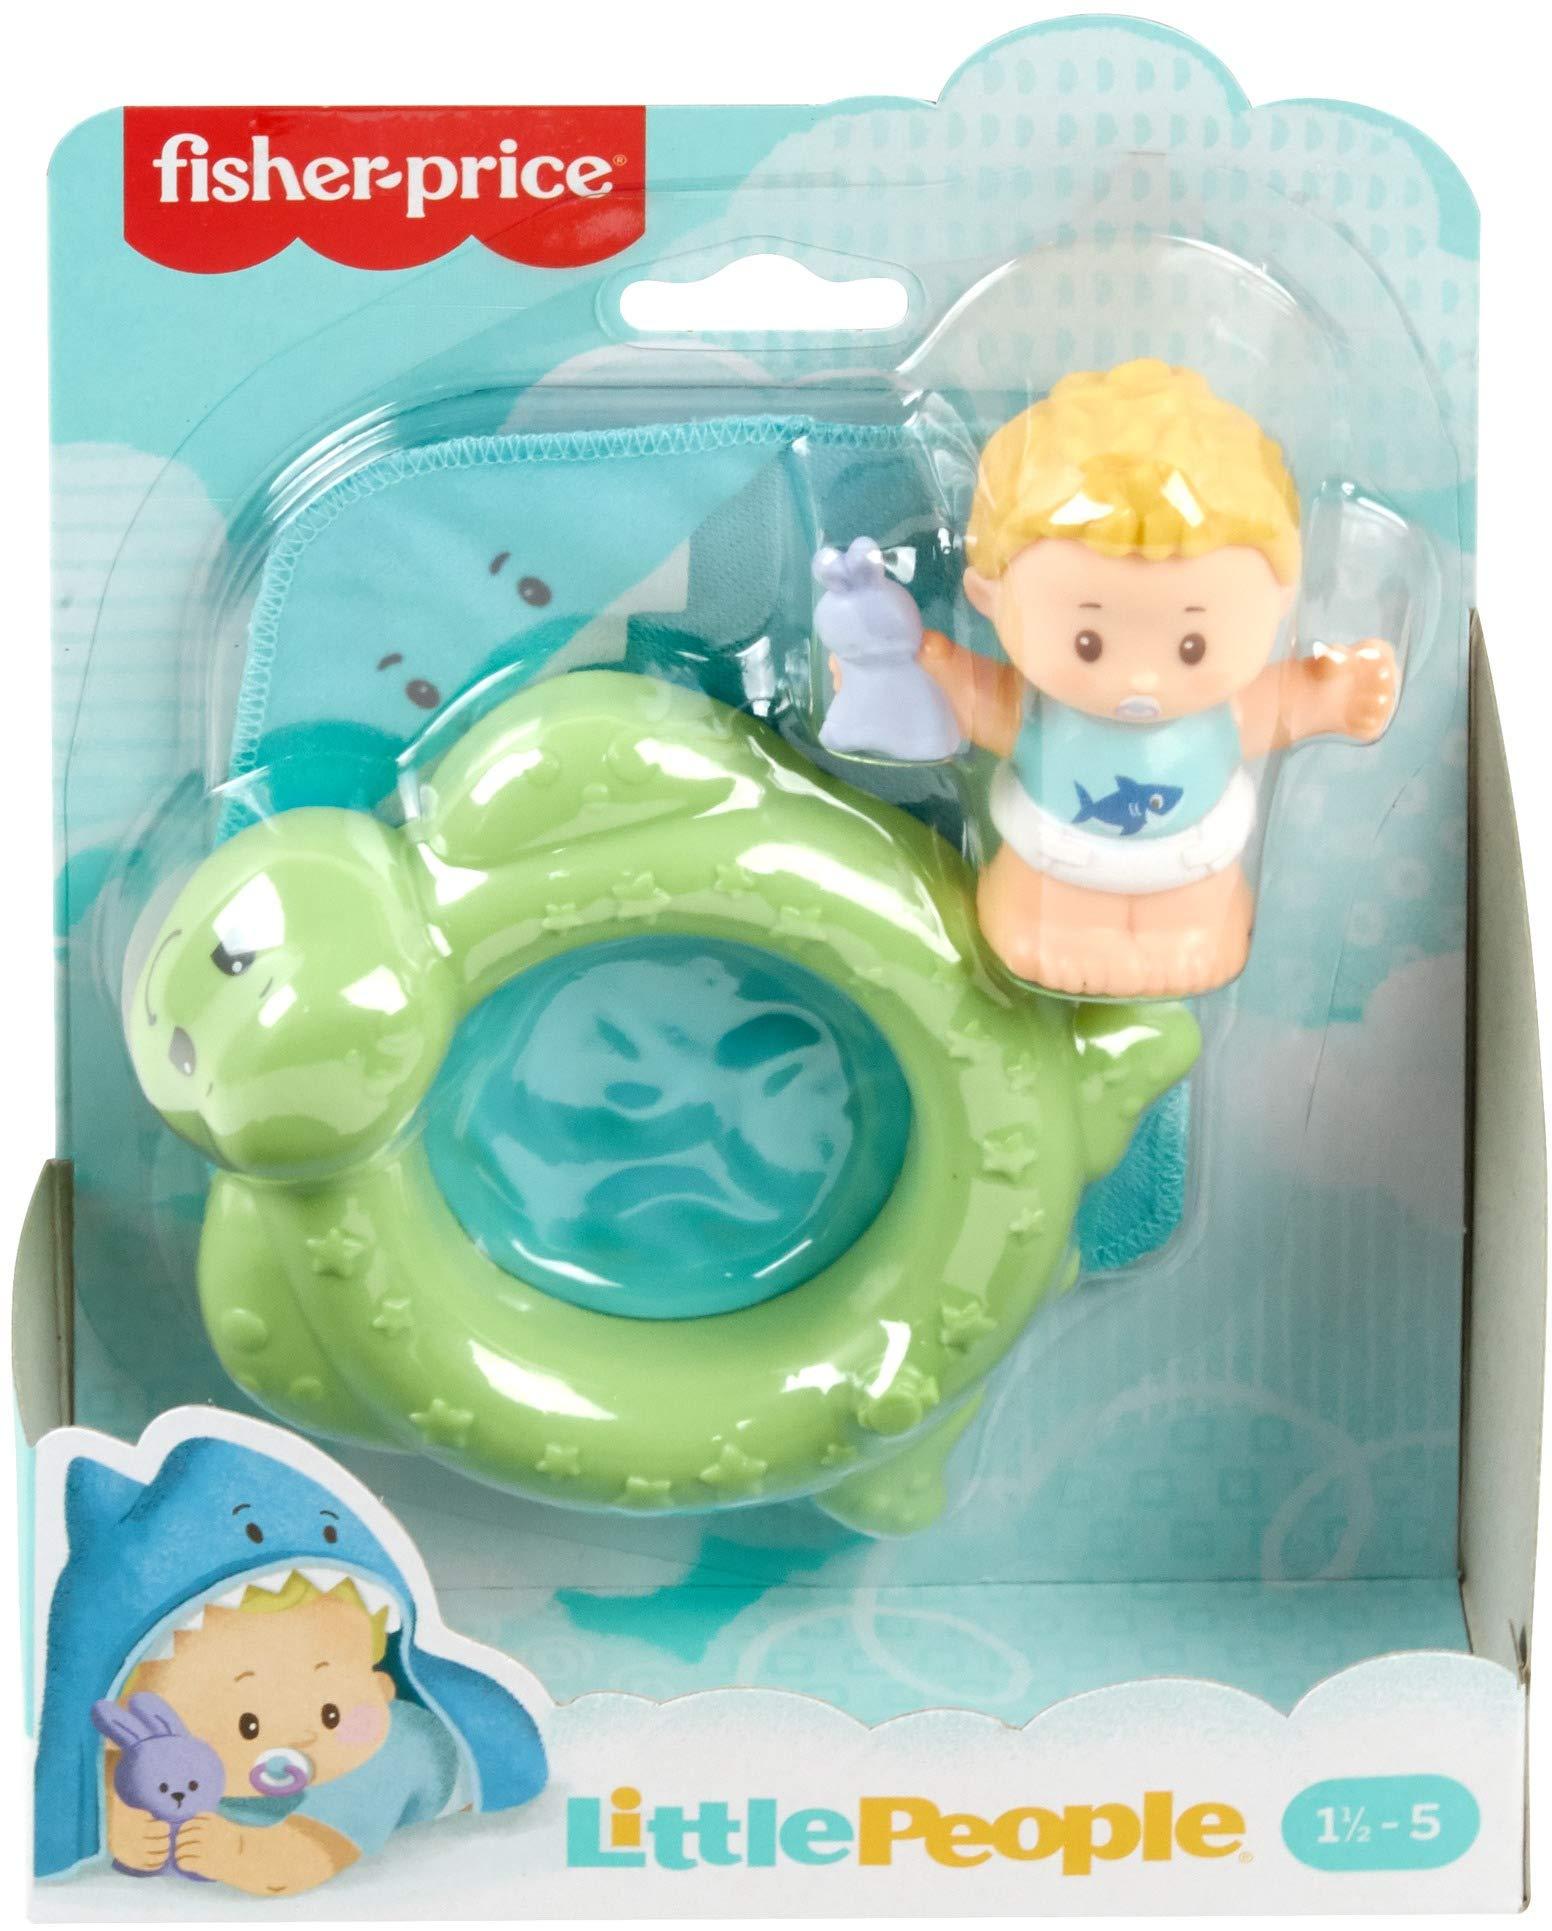 Little People Bundle /'n Play Baby FIgure and swim pool *pkg damage*